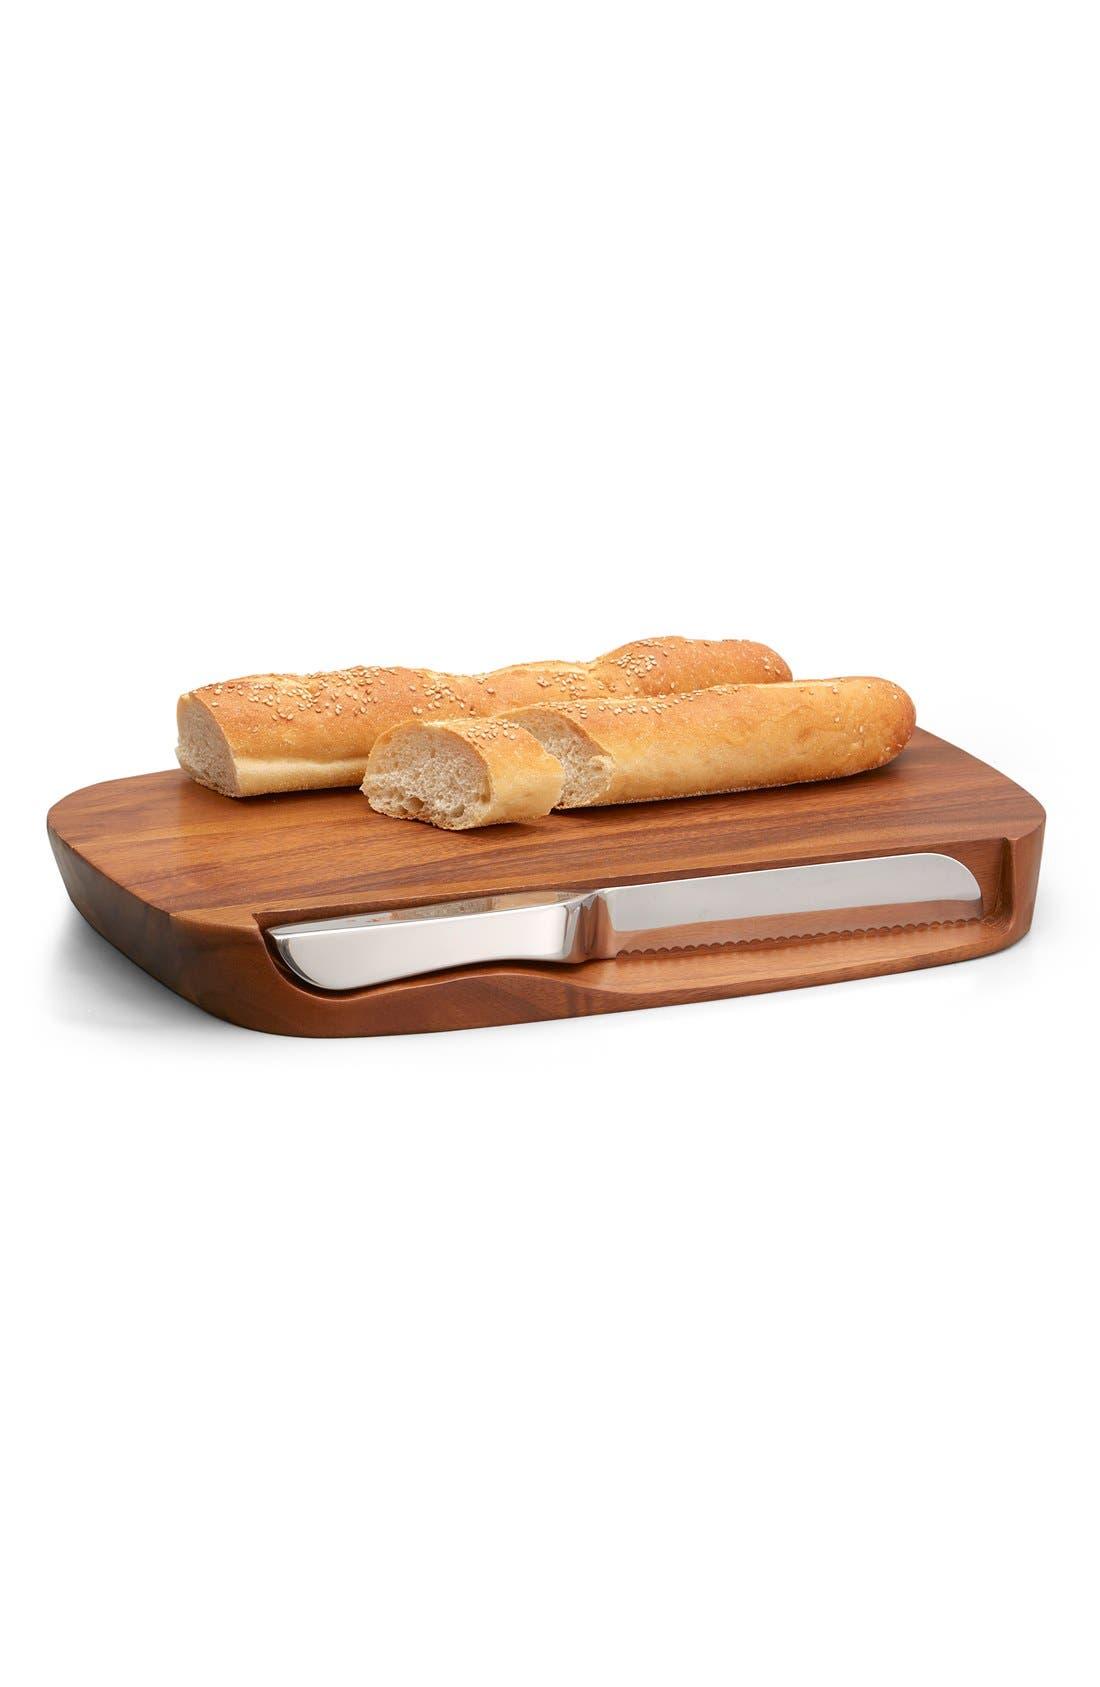 'Blend' Bread Board & Knife,                         Main,                         color, 200